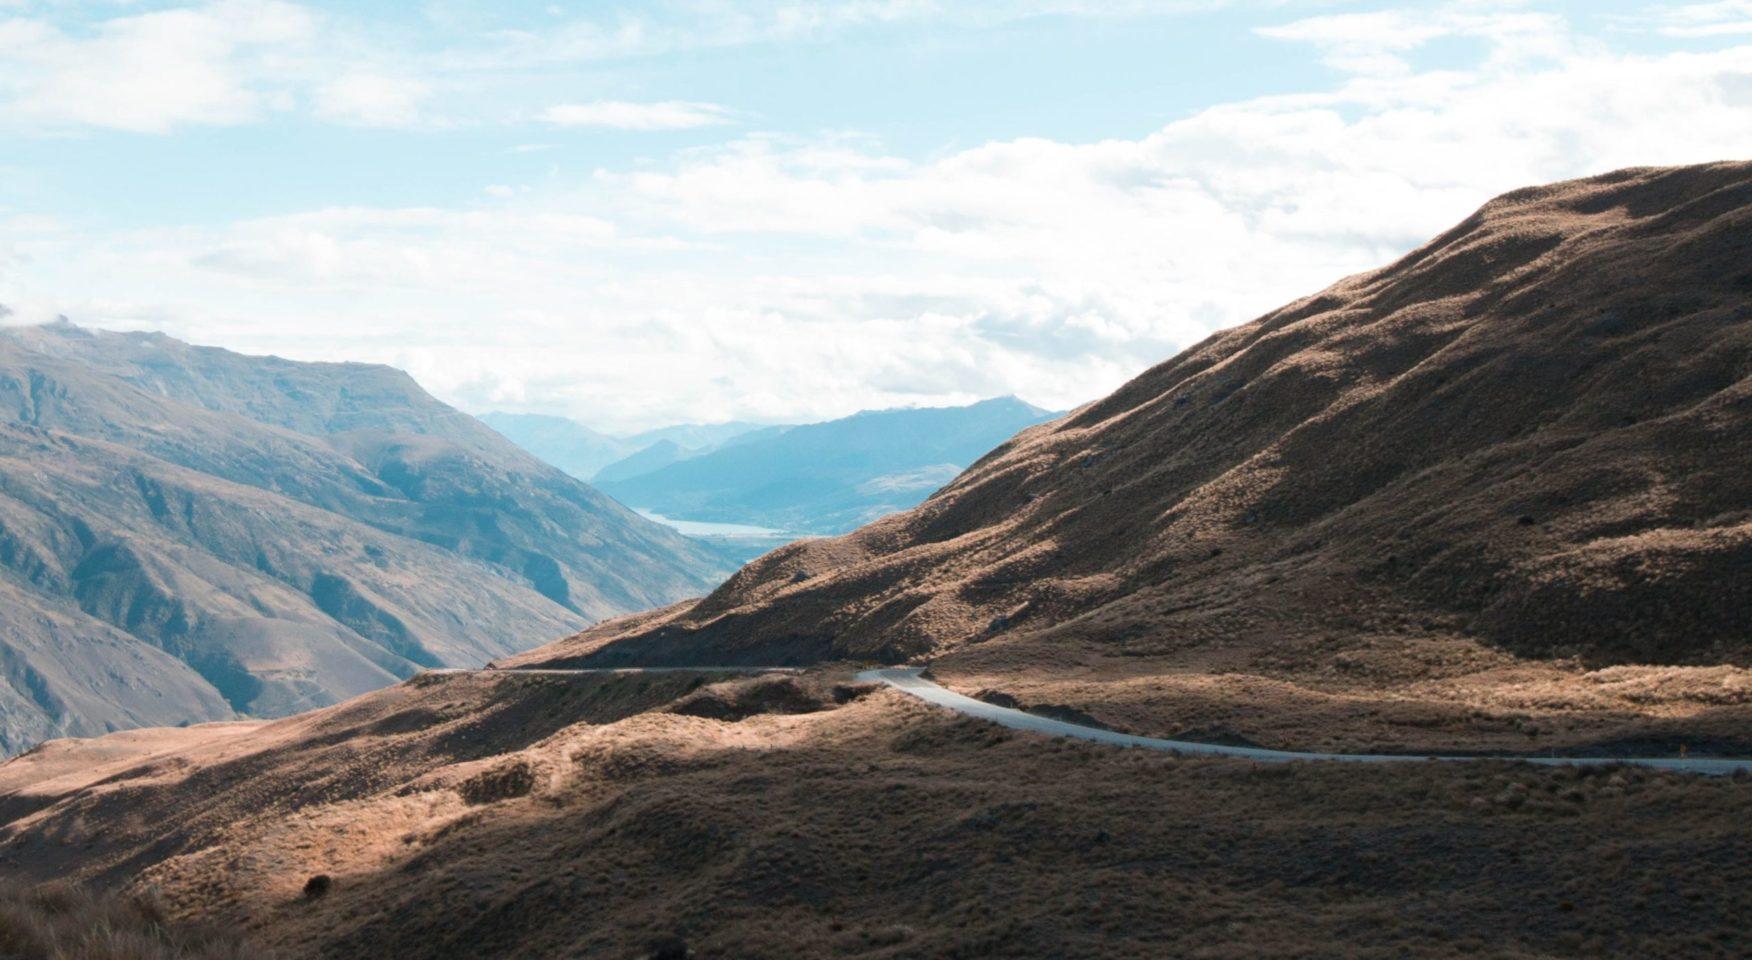 Road winding through brown mountains